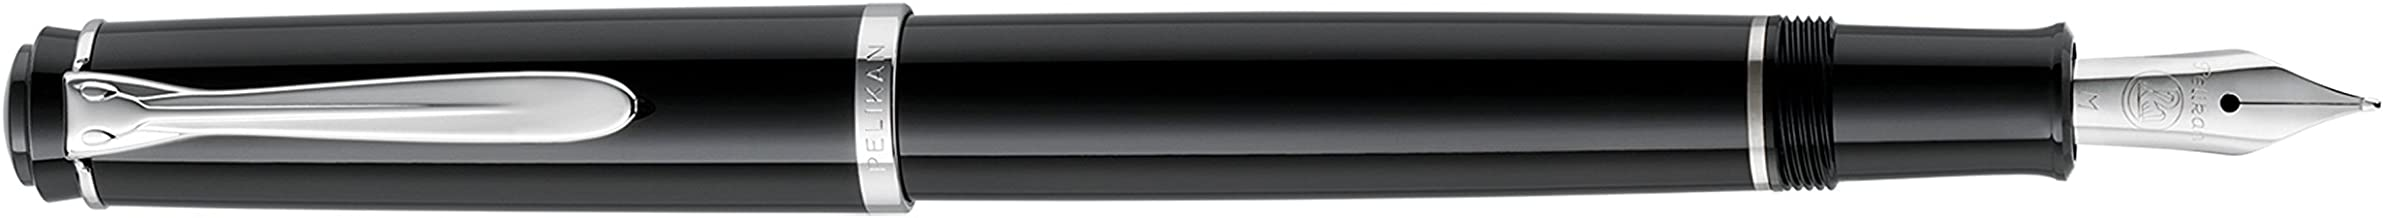 Pelikan, M1000 Souveran Fountain Pen, Green w/Black Cap & Gold Plated Trim